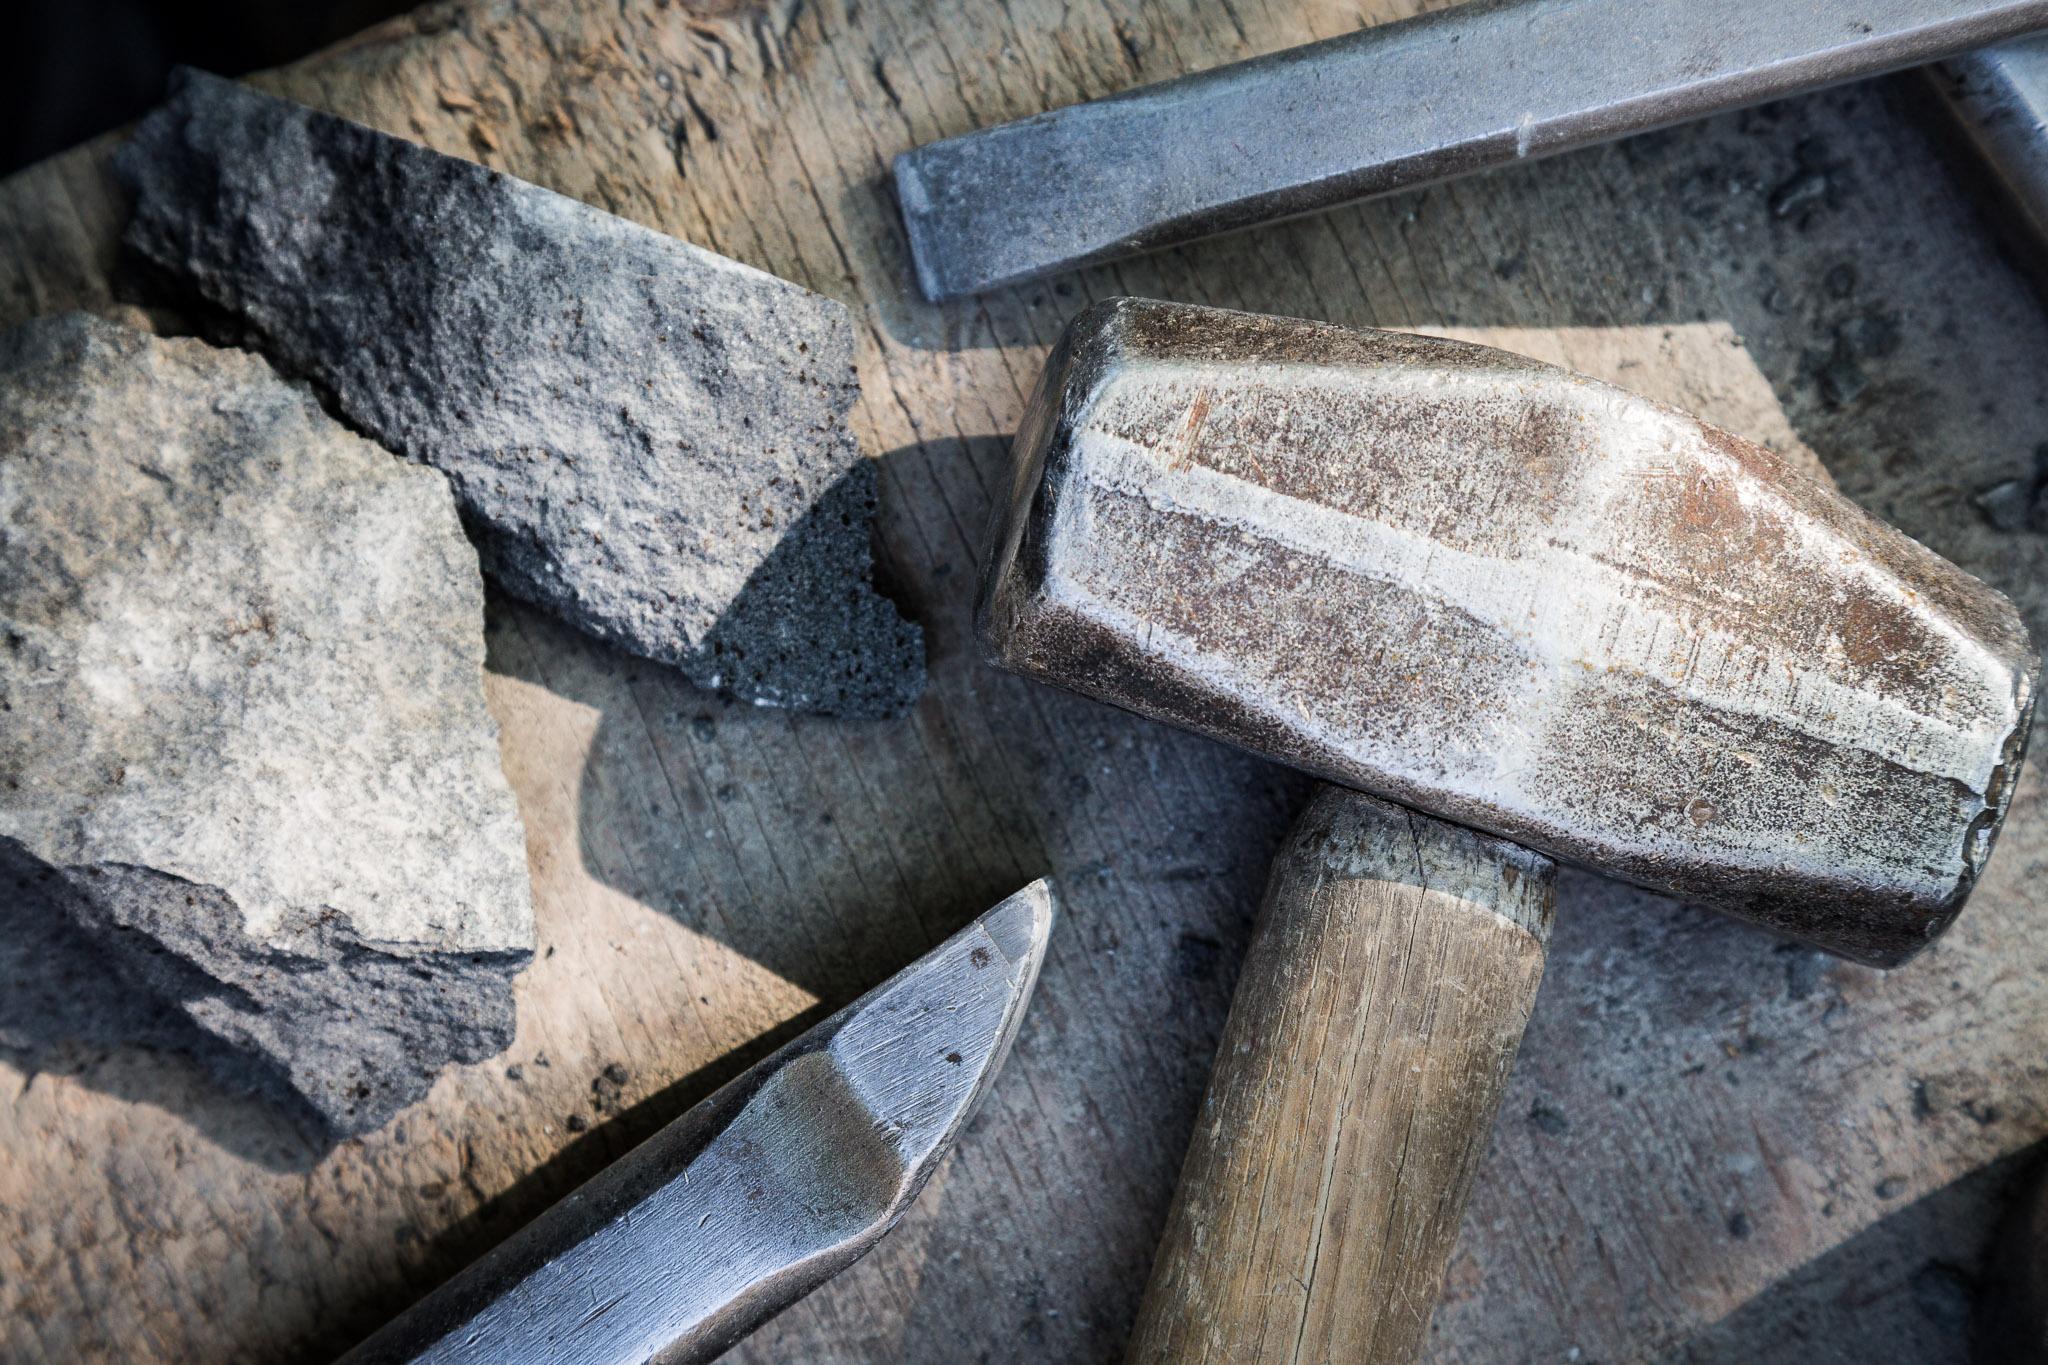 Eric Contey Stonework - timeless work in stone